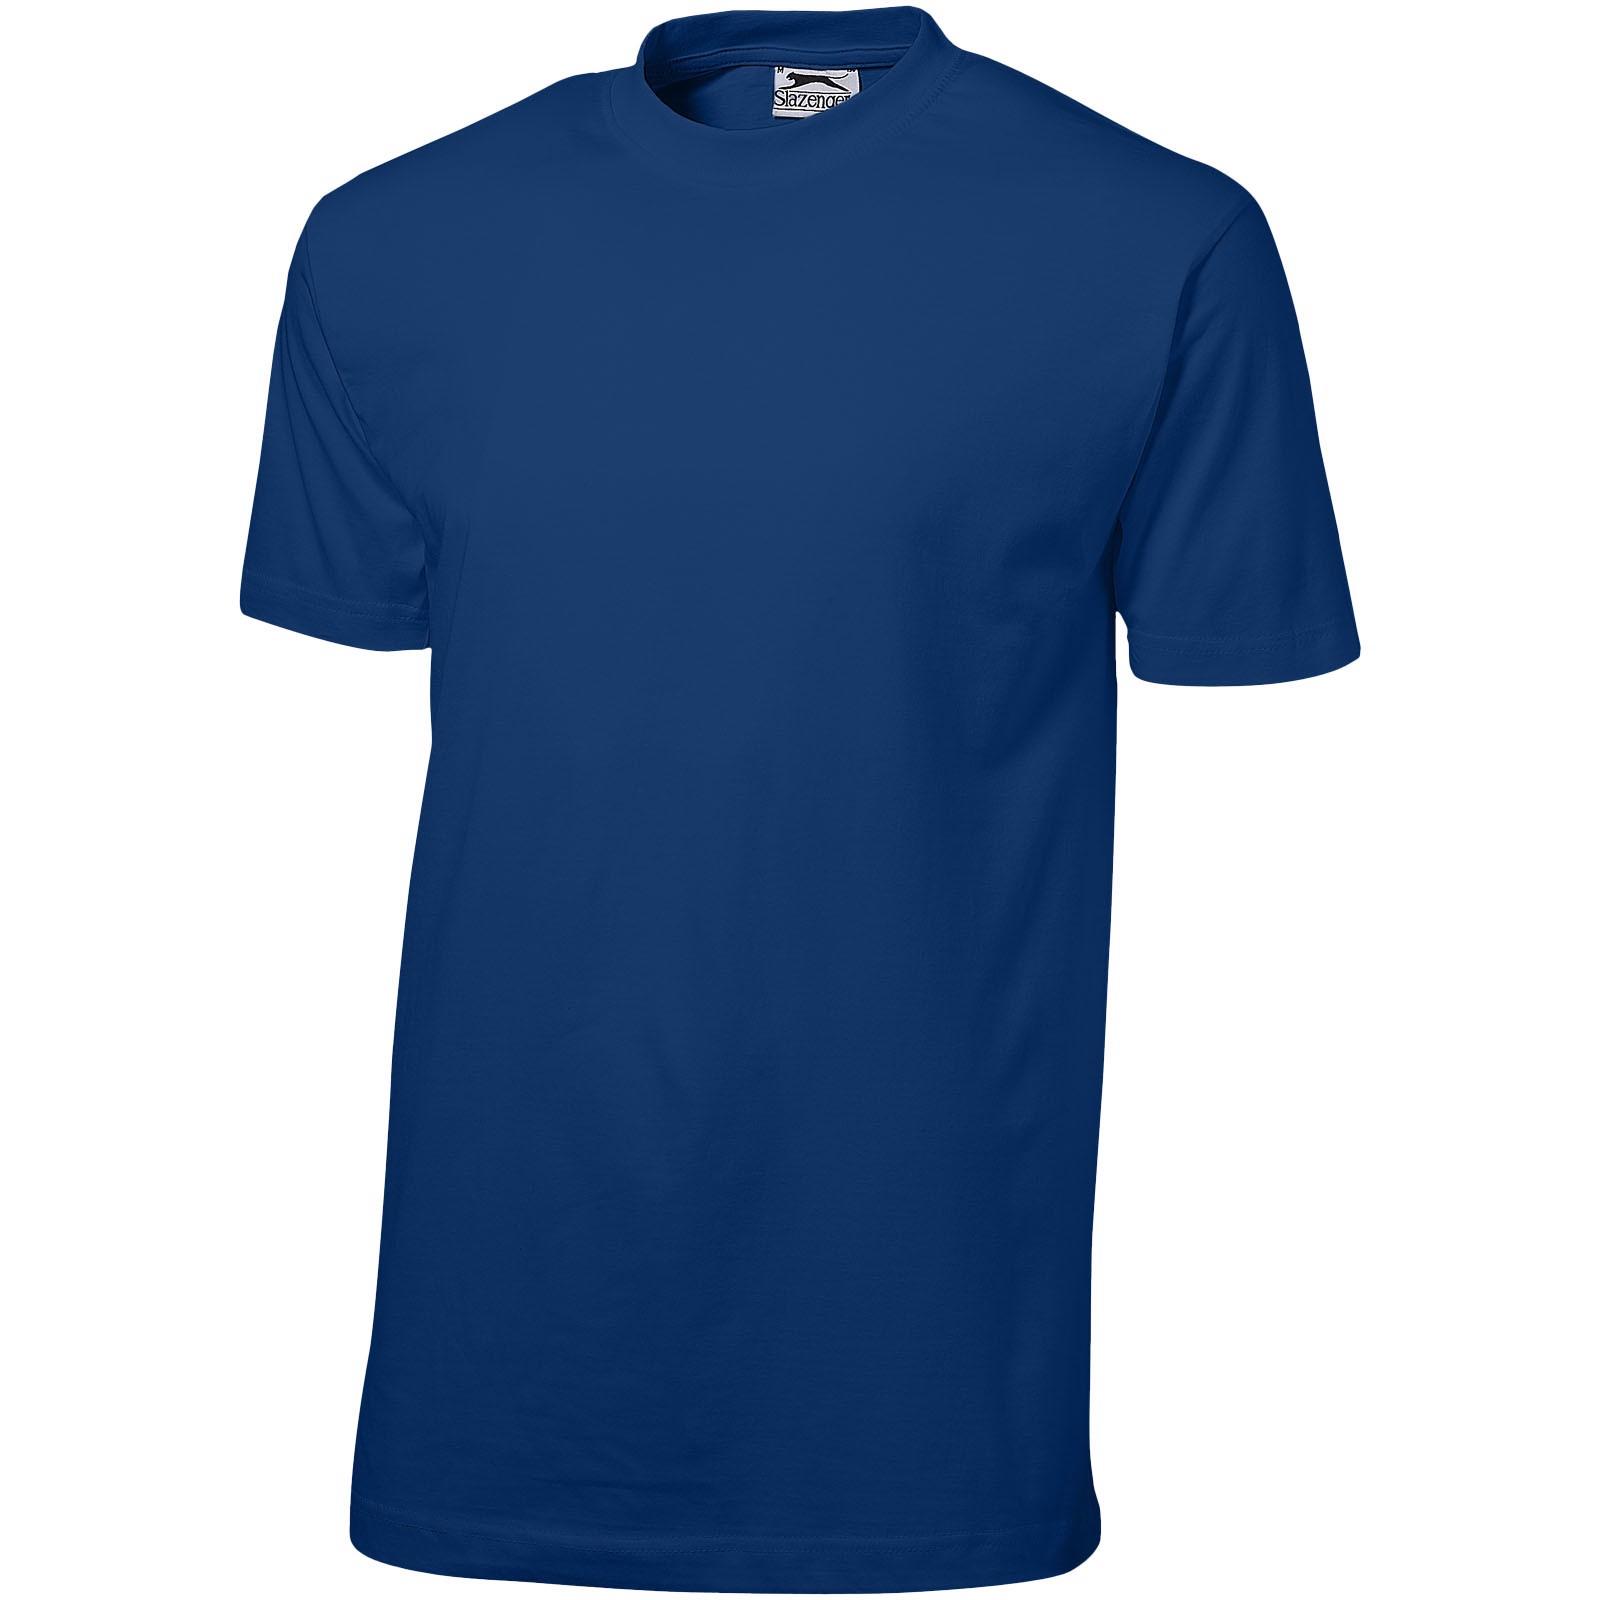 Ace short sleeve men's t-shirt - Classic royal blue / XXL